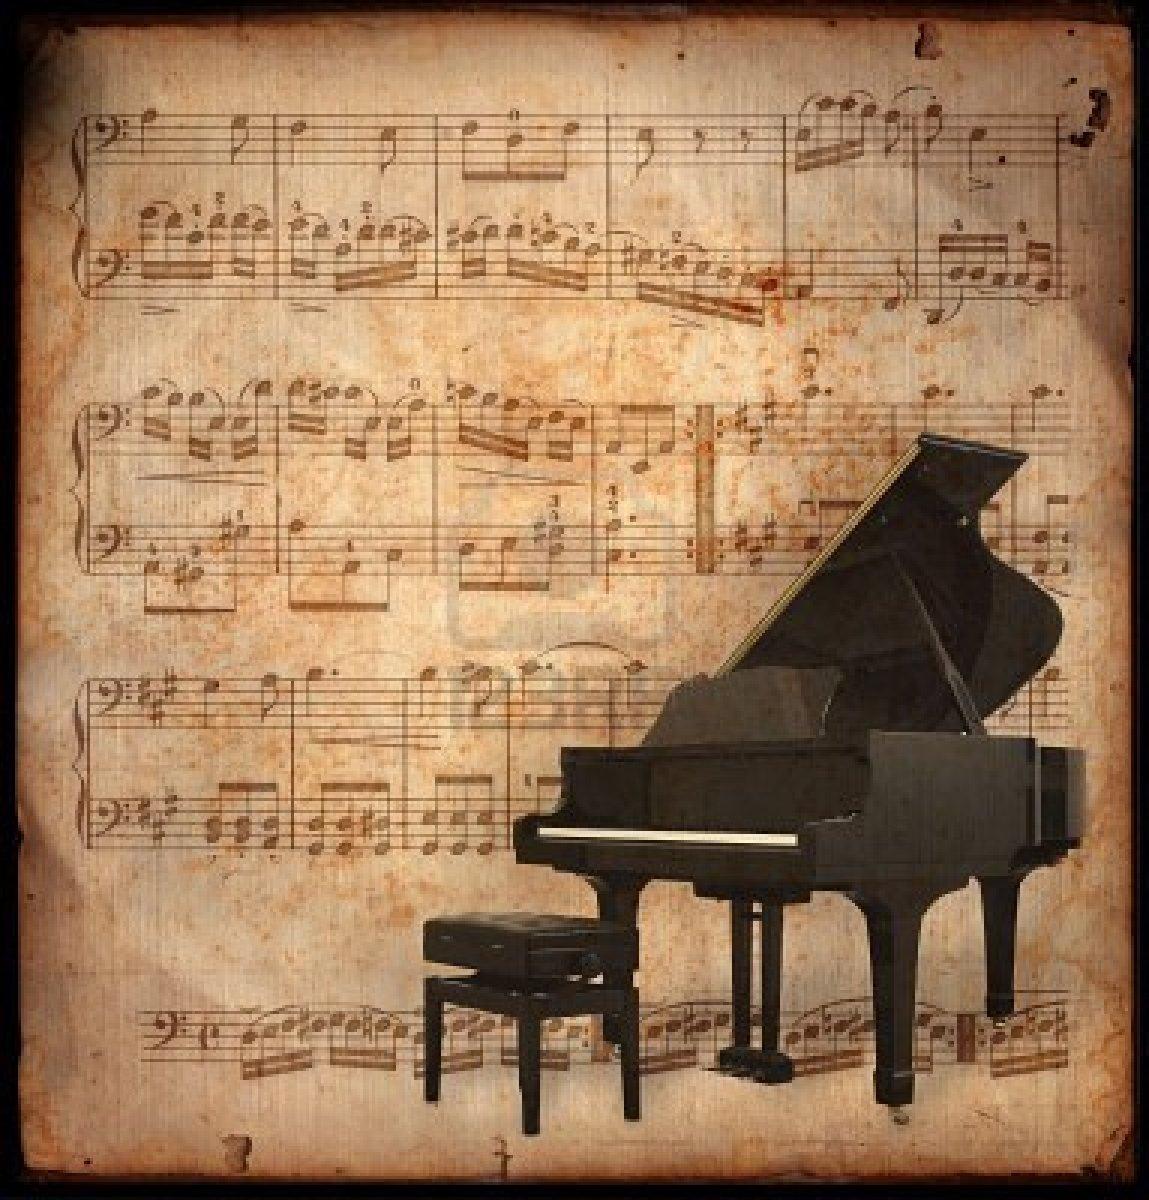 [61+] Piano Background Music On WallpaperSafari